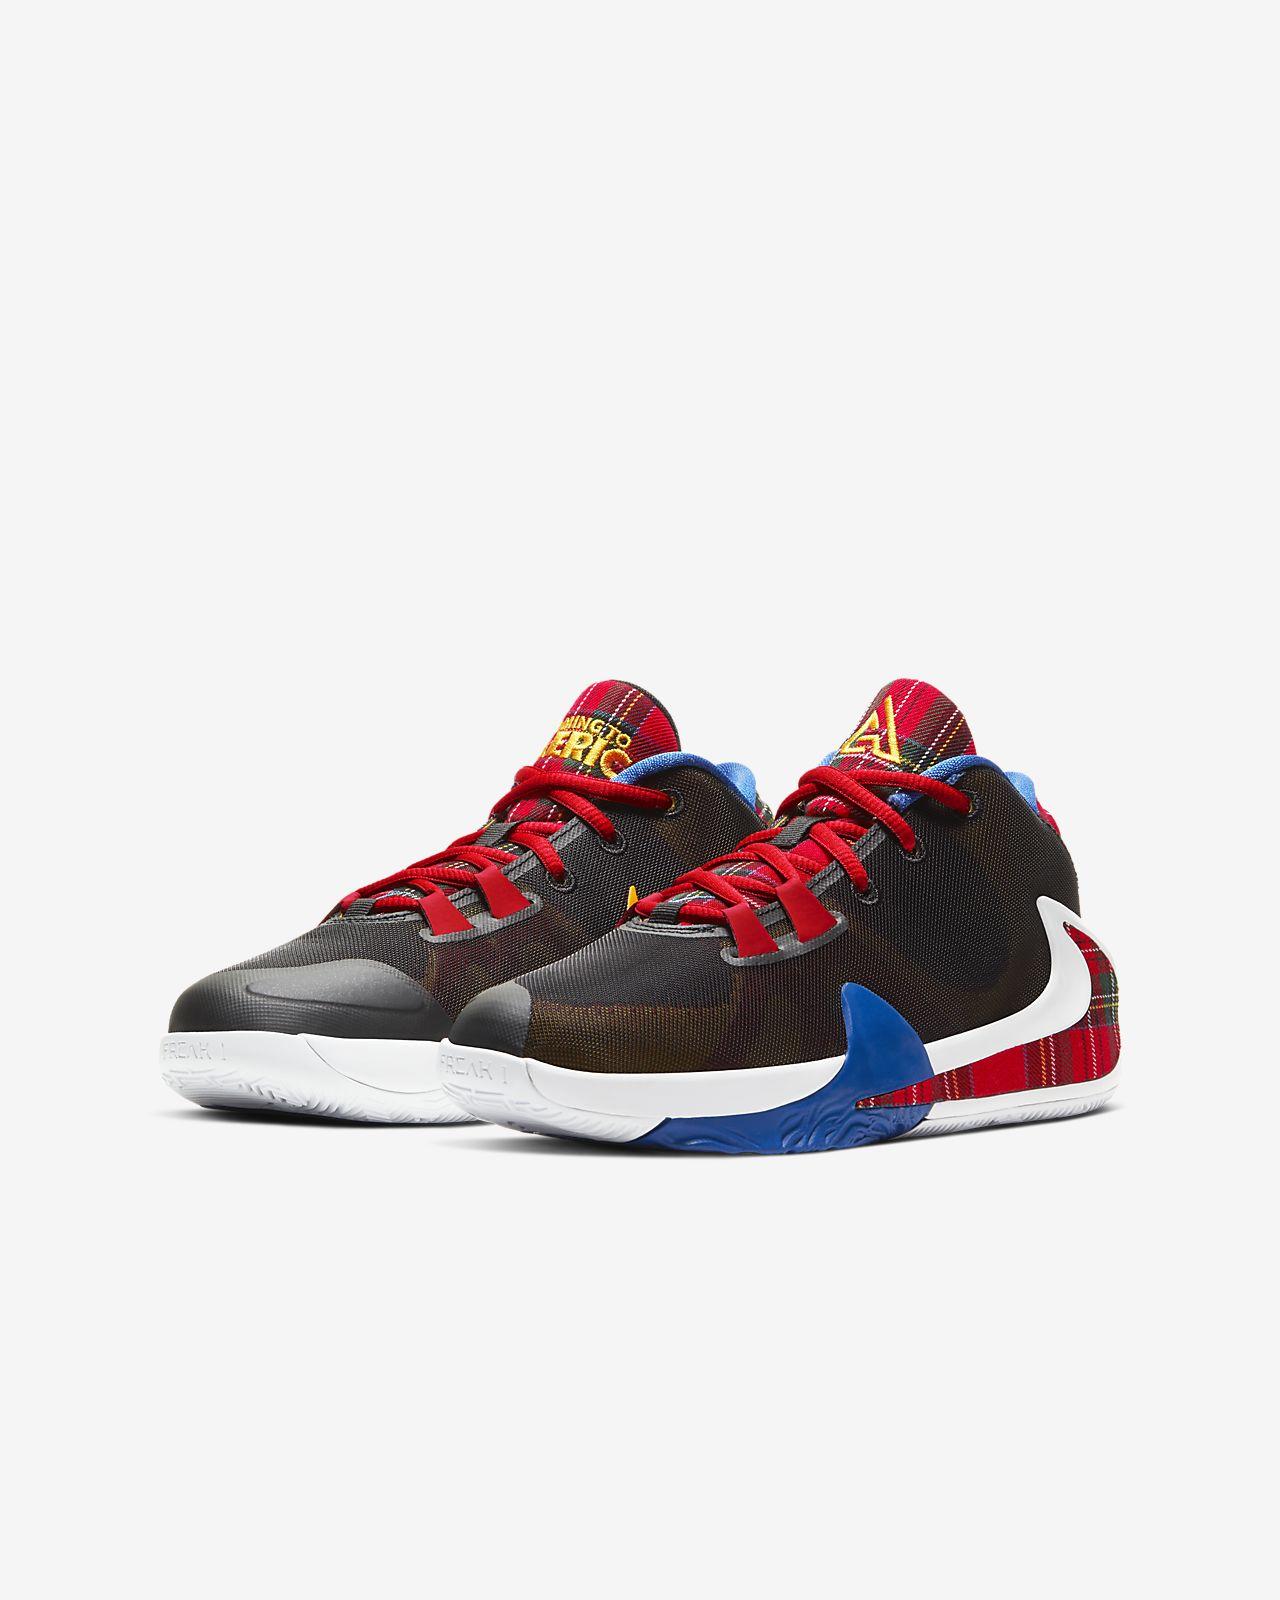 Nike Zoom GP Herren Basketballschuhe Lifestyle Gary Payton